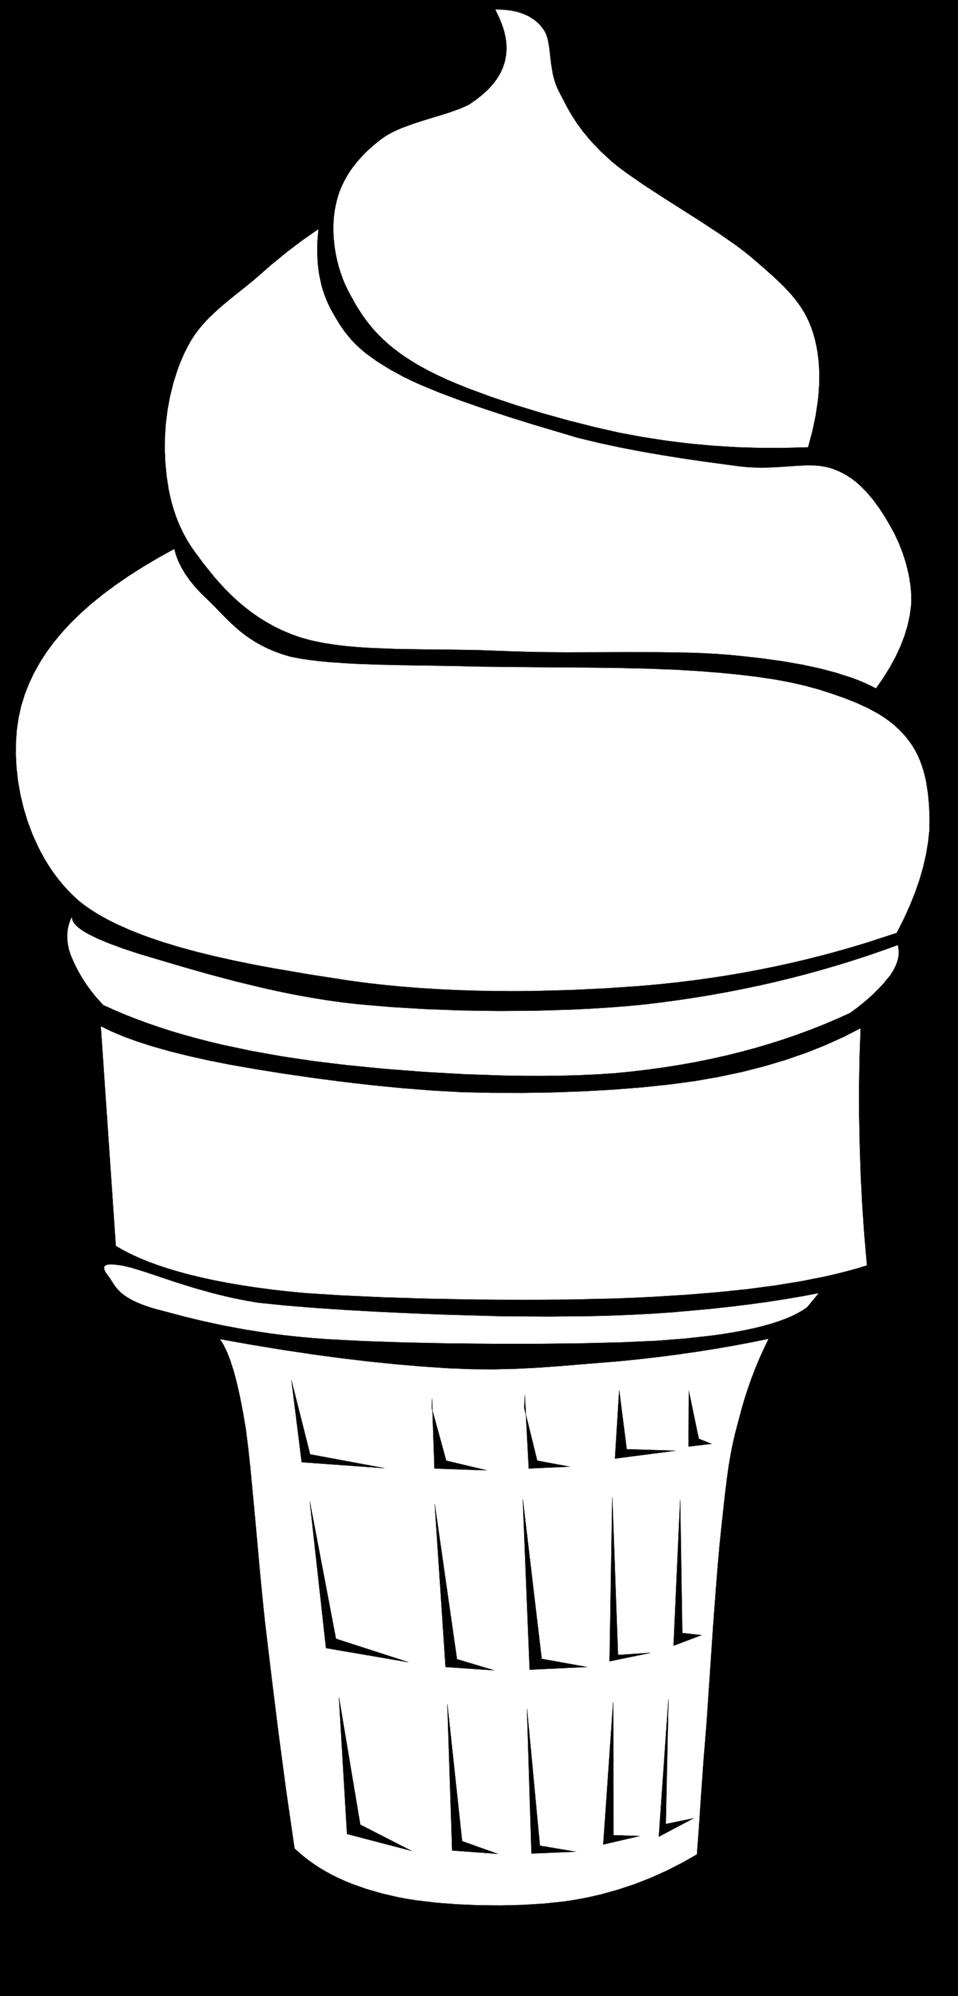 Fast Food Desserts Ice Cream Cones Soft Serve Soft Serve Fast Food Soft Serve Ice Cream